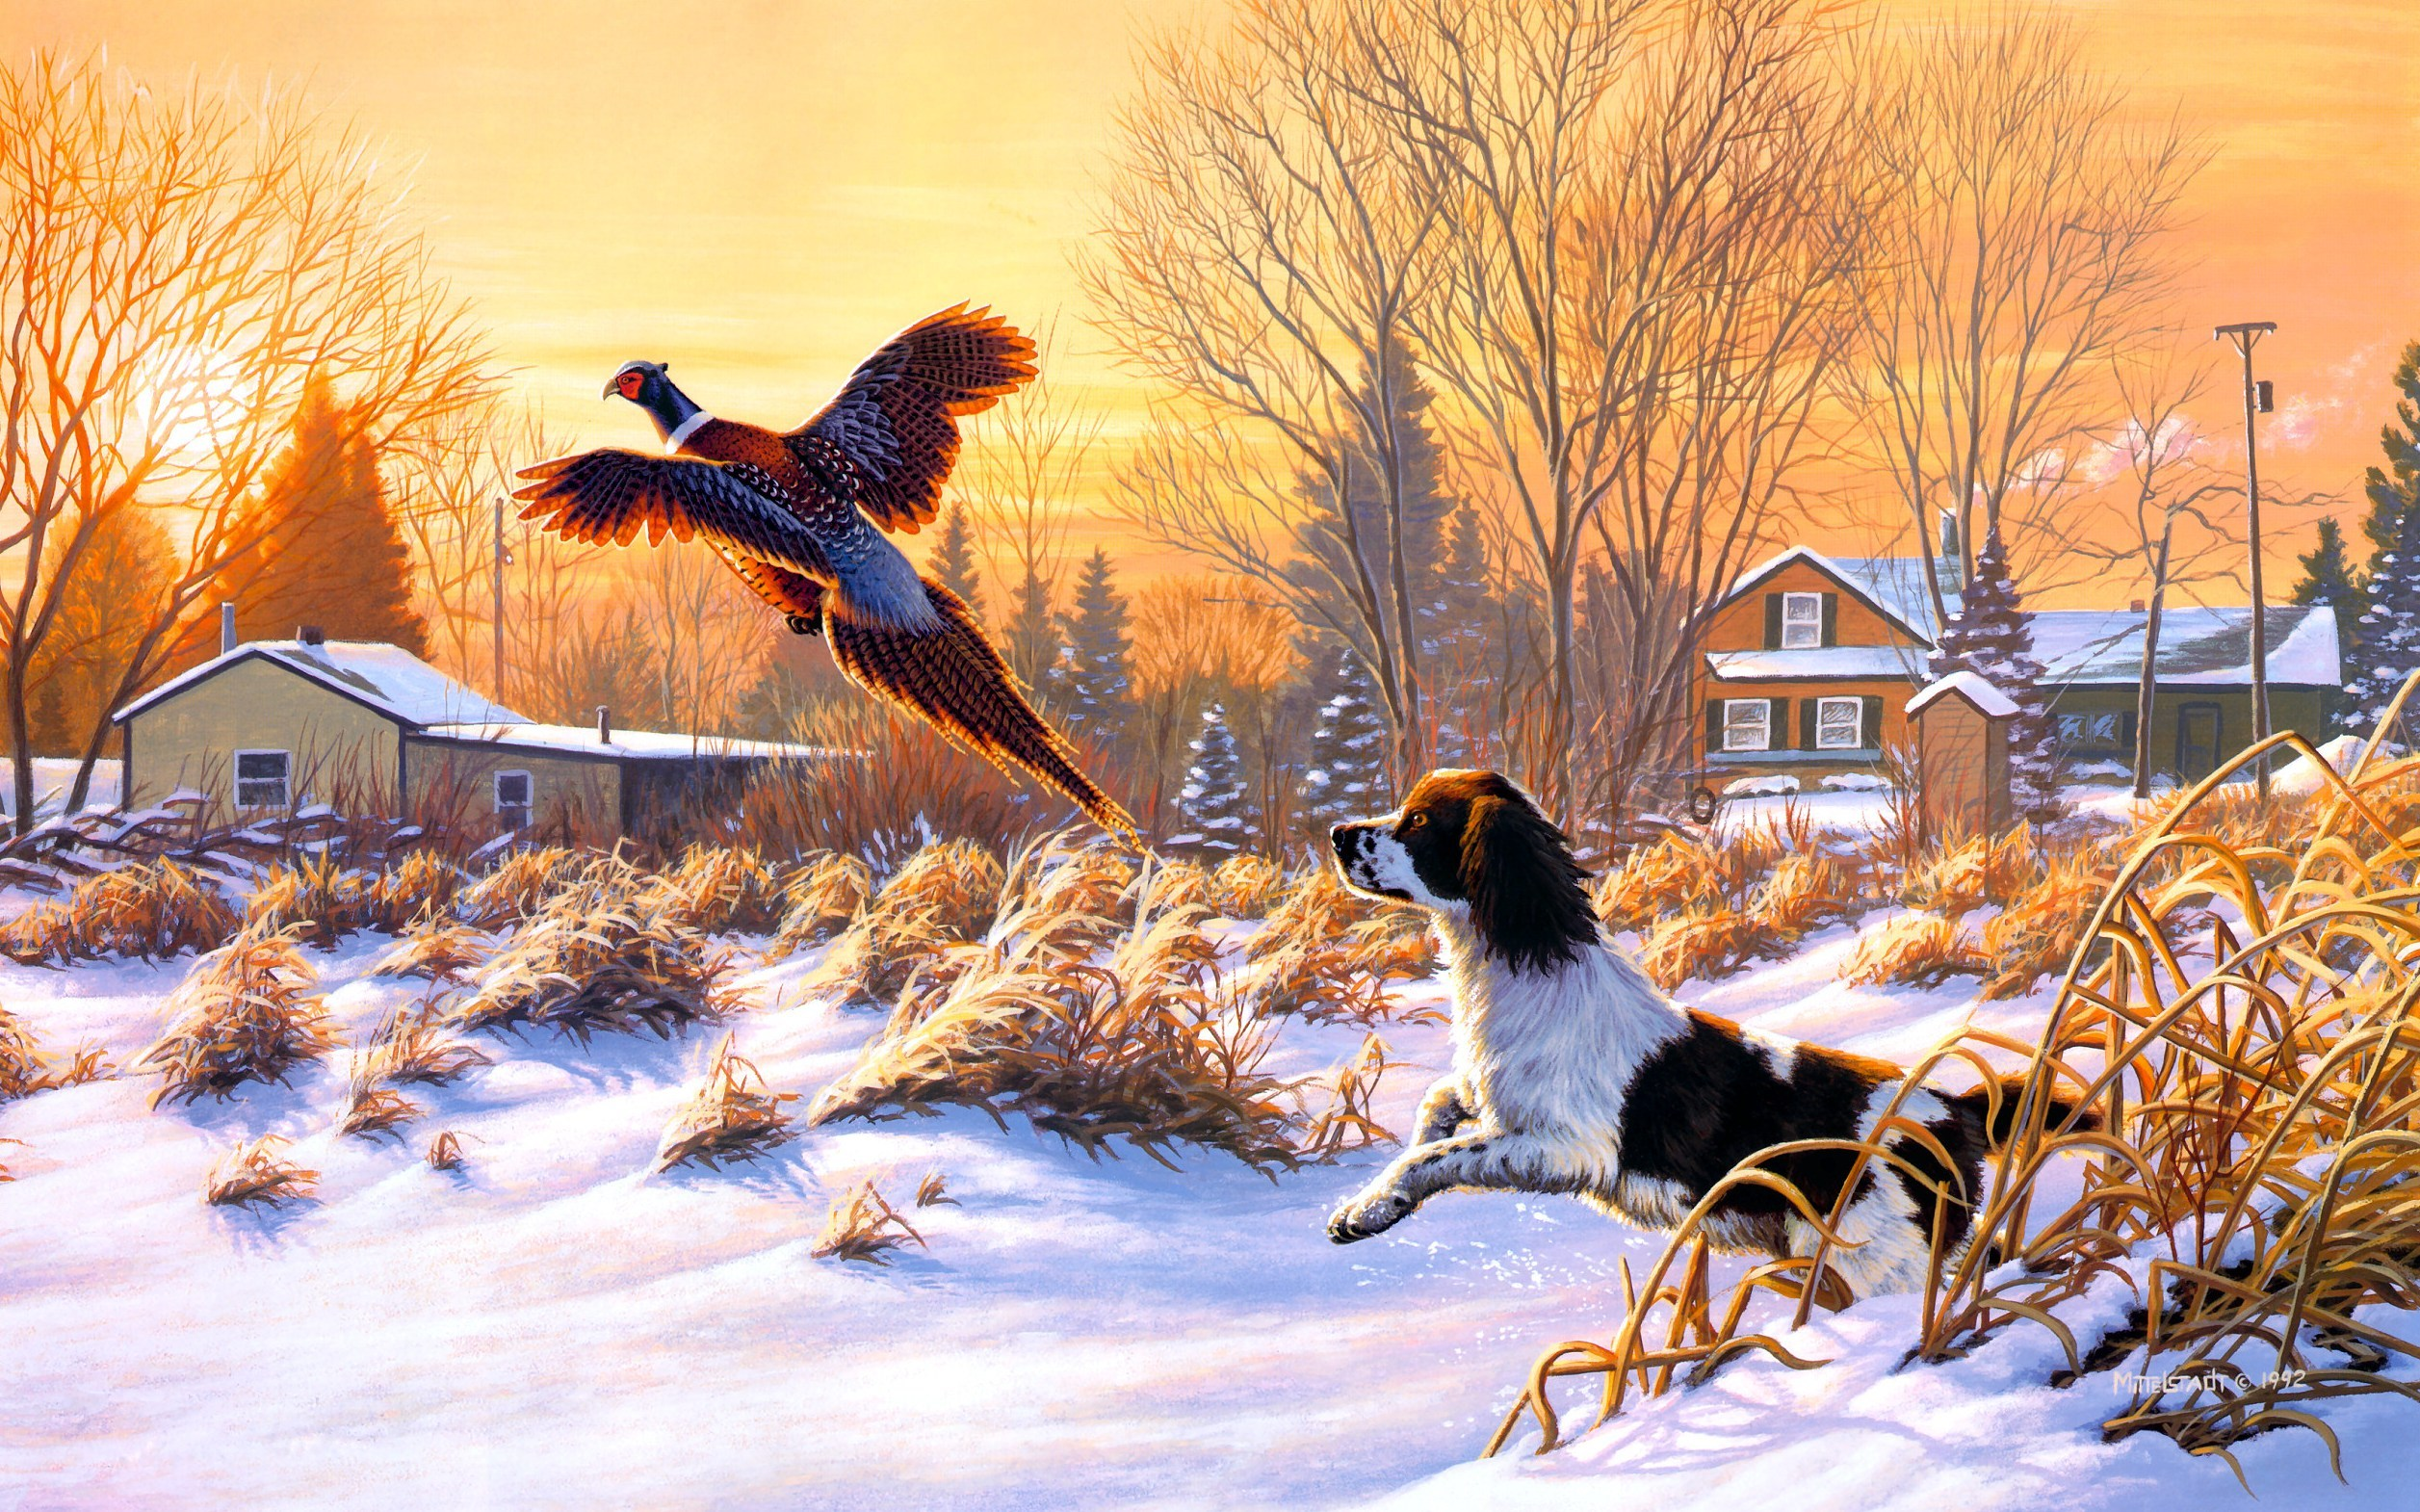 art nature winter snow hunting dog bird fly sunrise painting 2513x1570